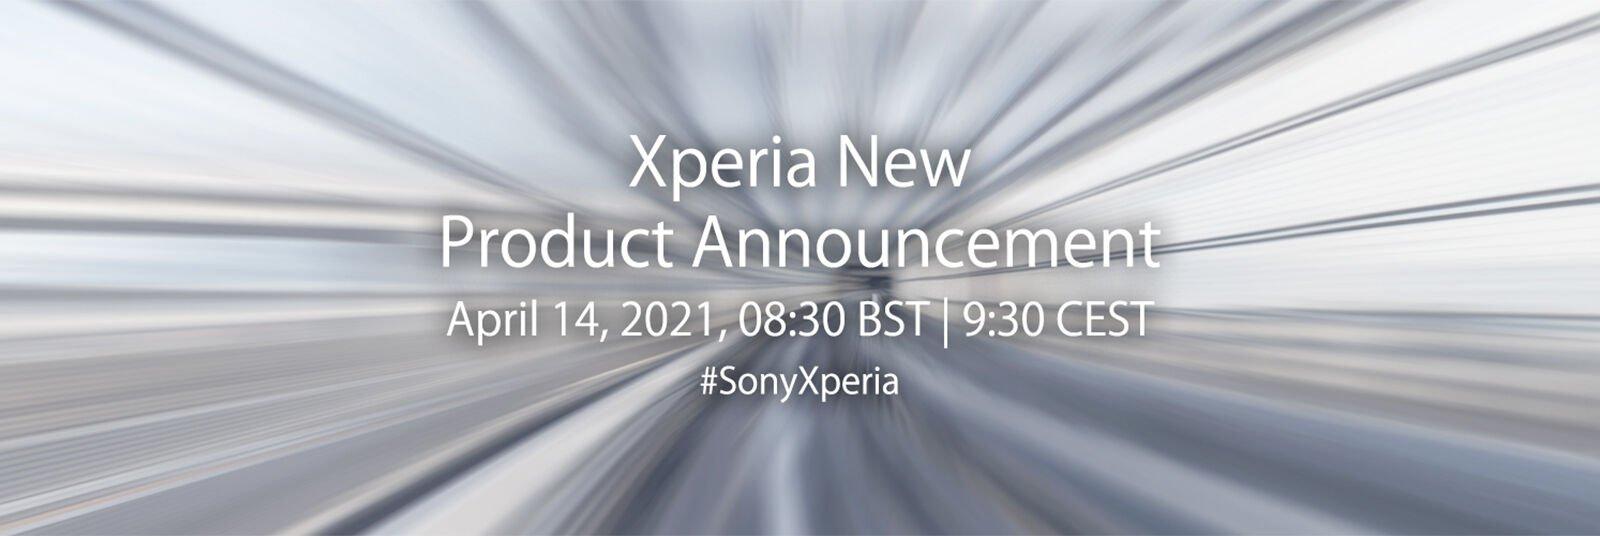 Sony Xperia 14 April event header